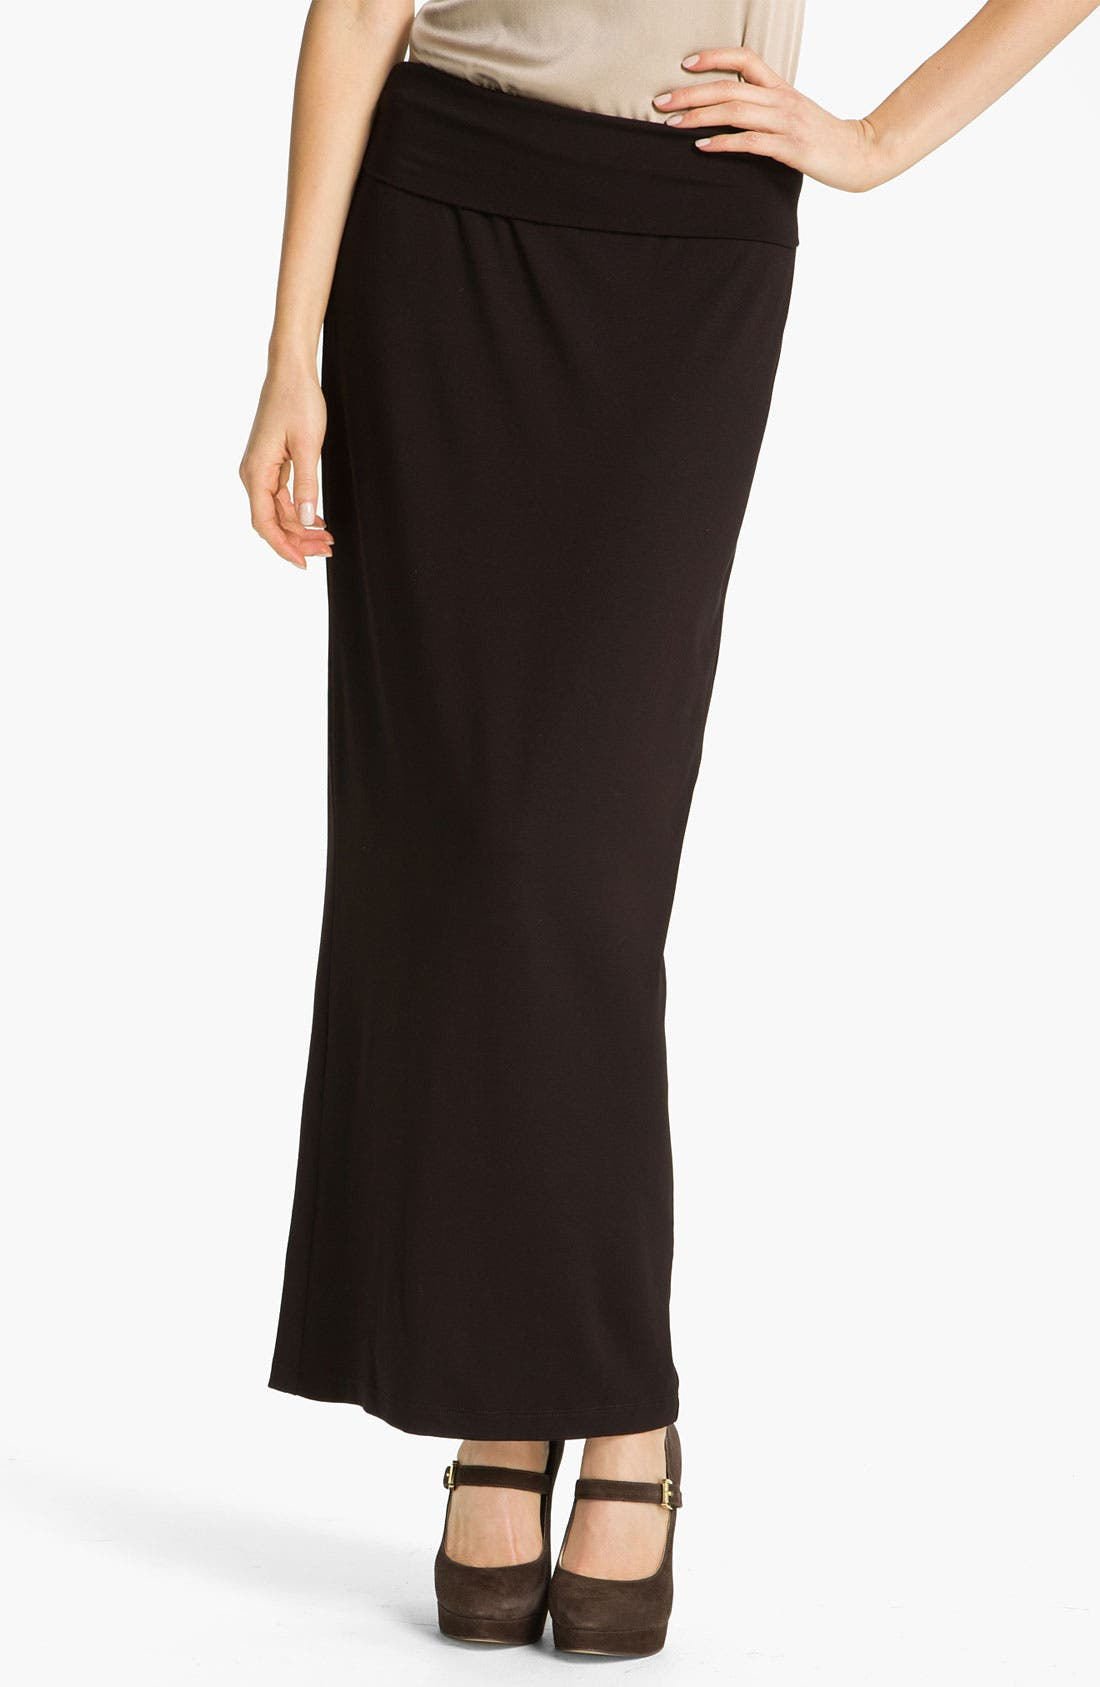 Main Image - Eileen Fisher Fold Over Slim Maxi Skirt